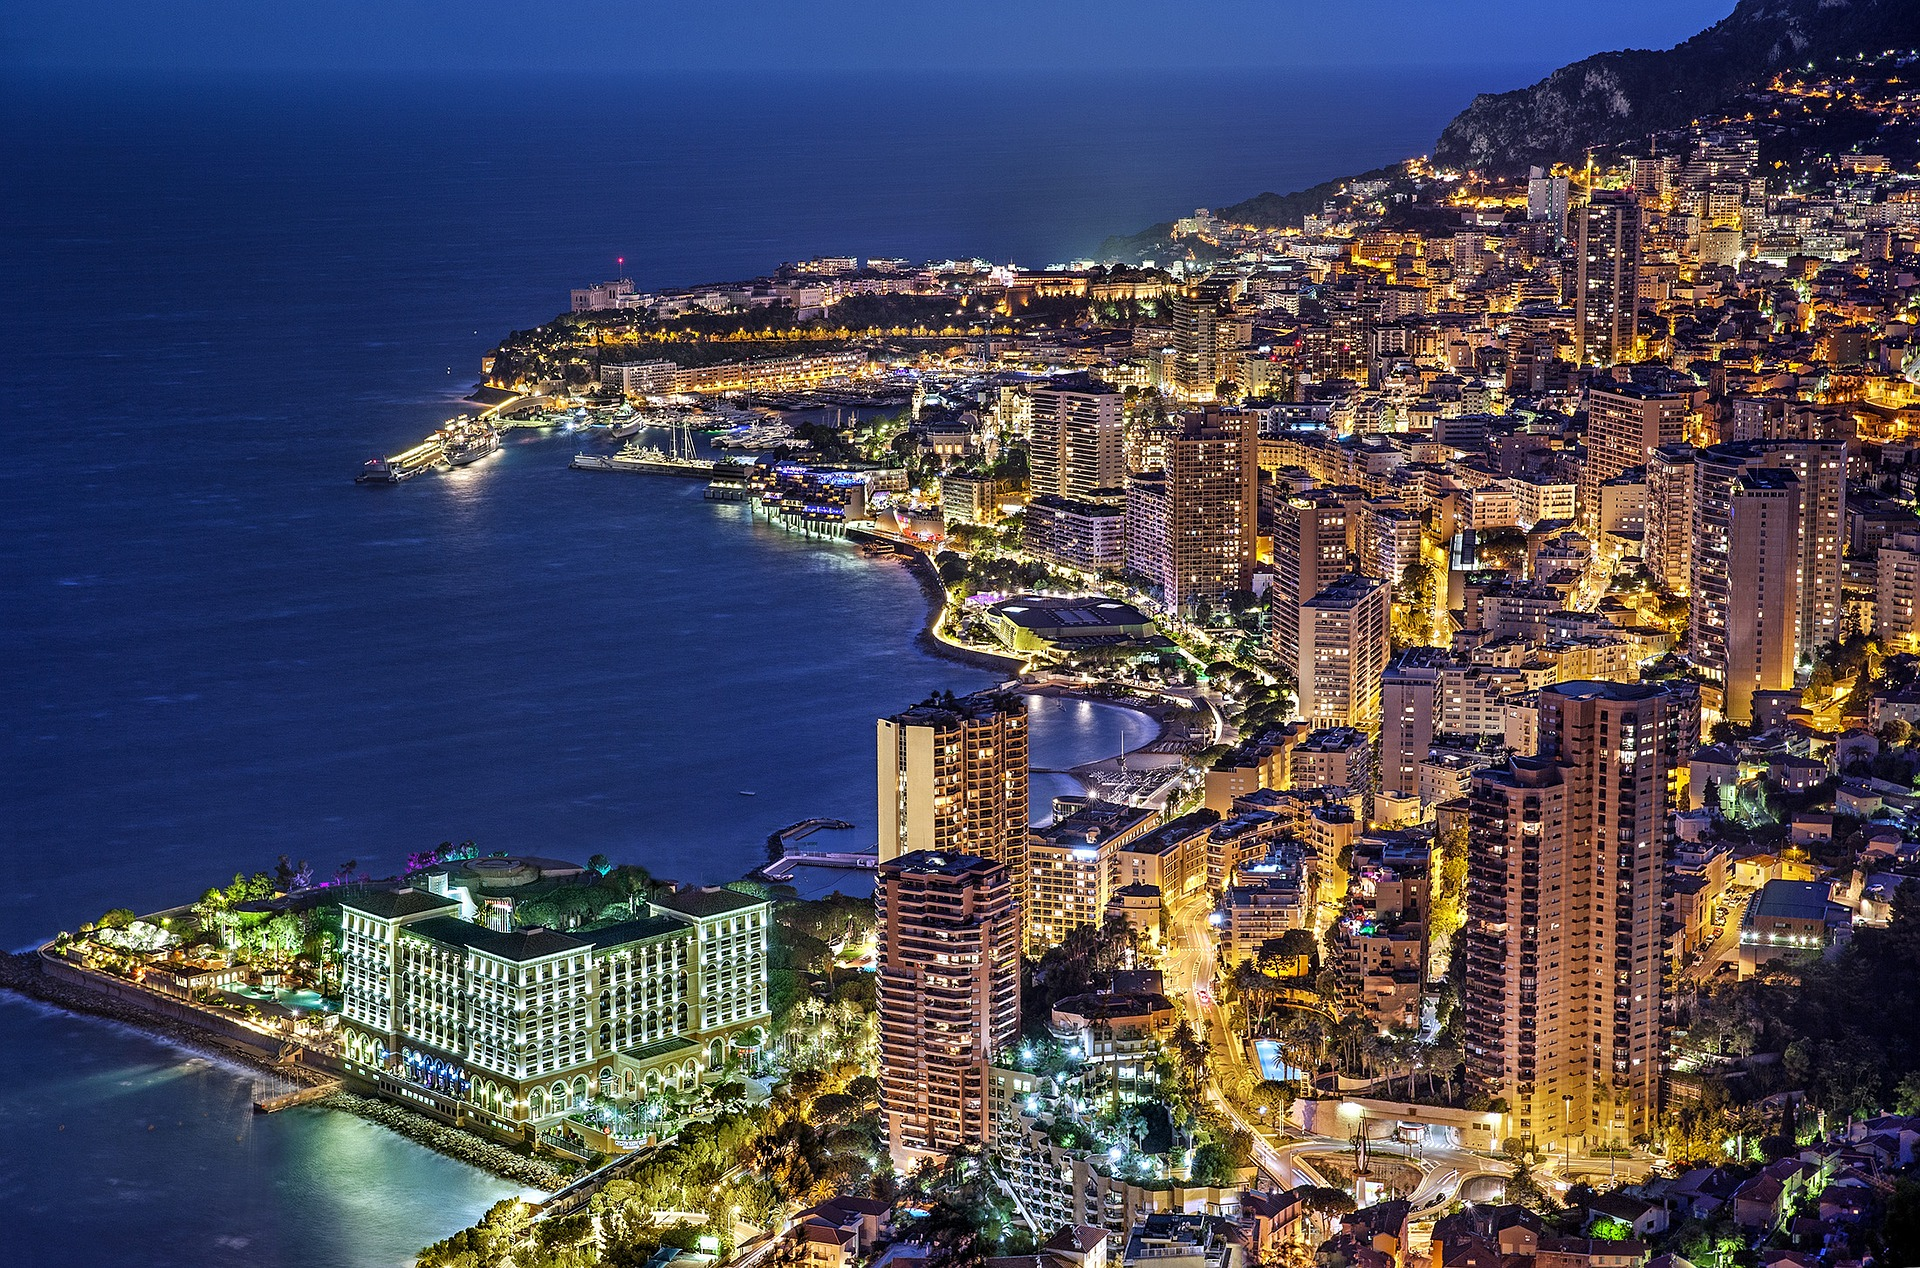 Gjøre - Monte Carlo